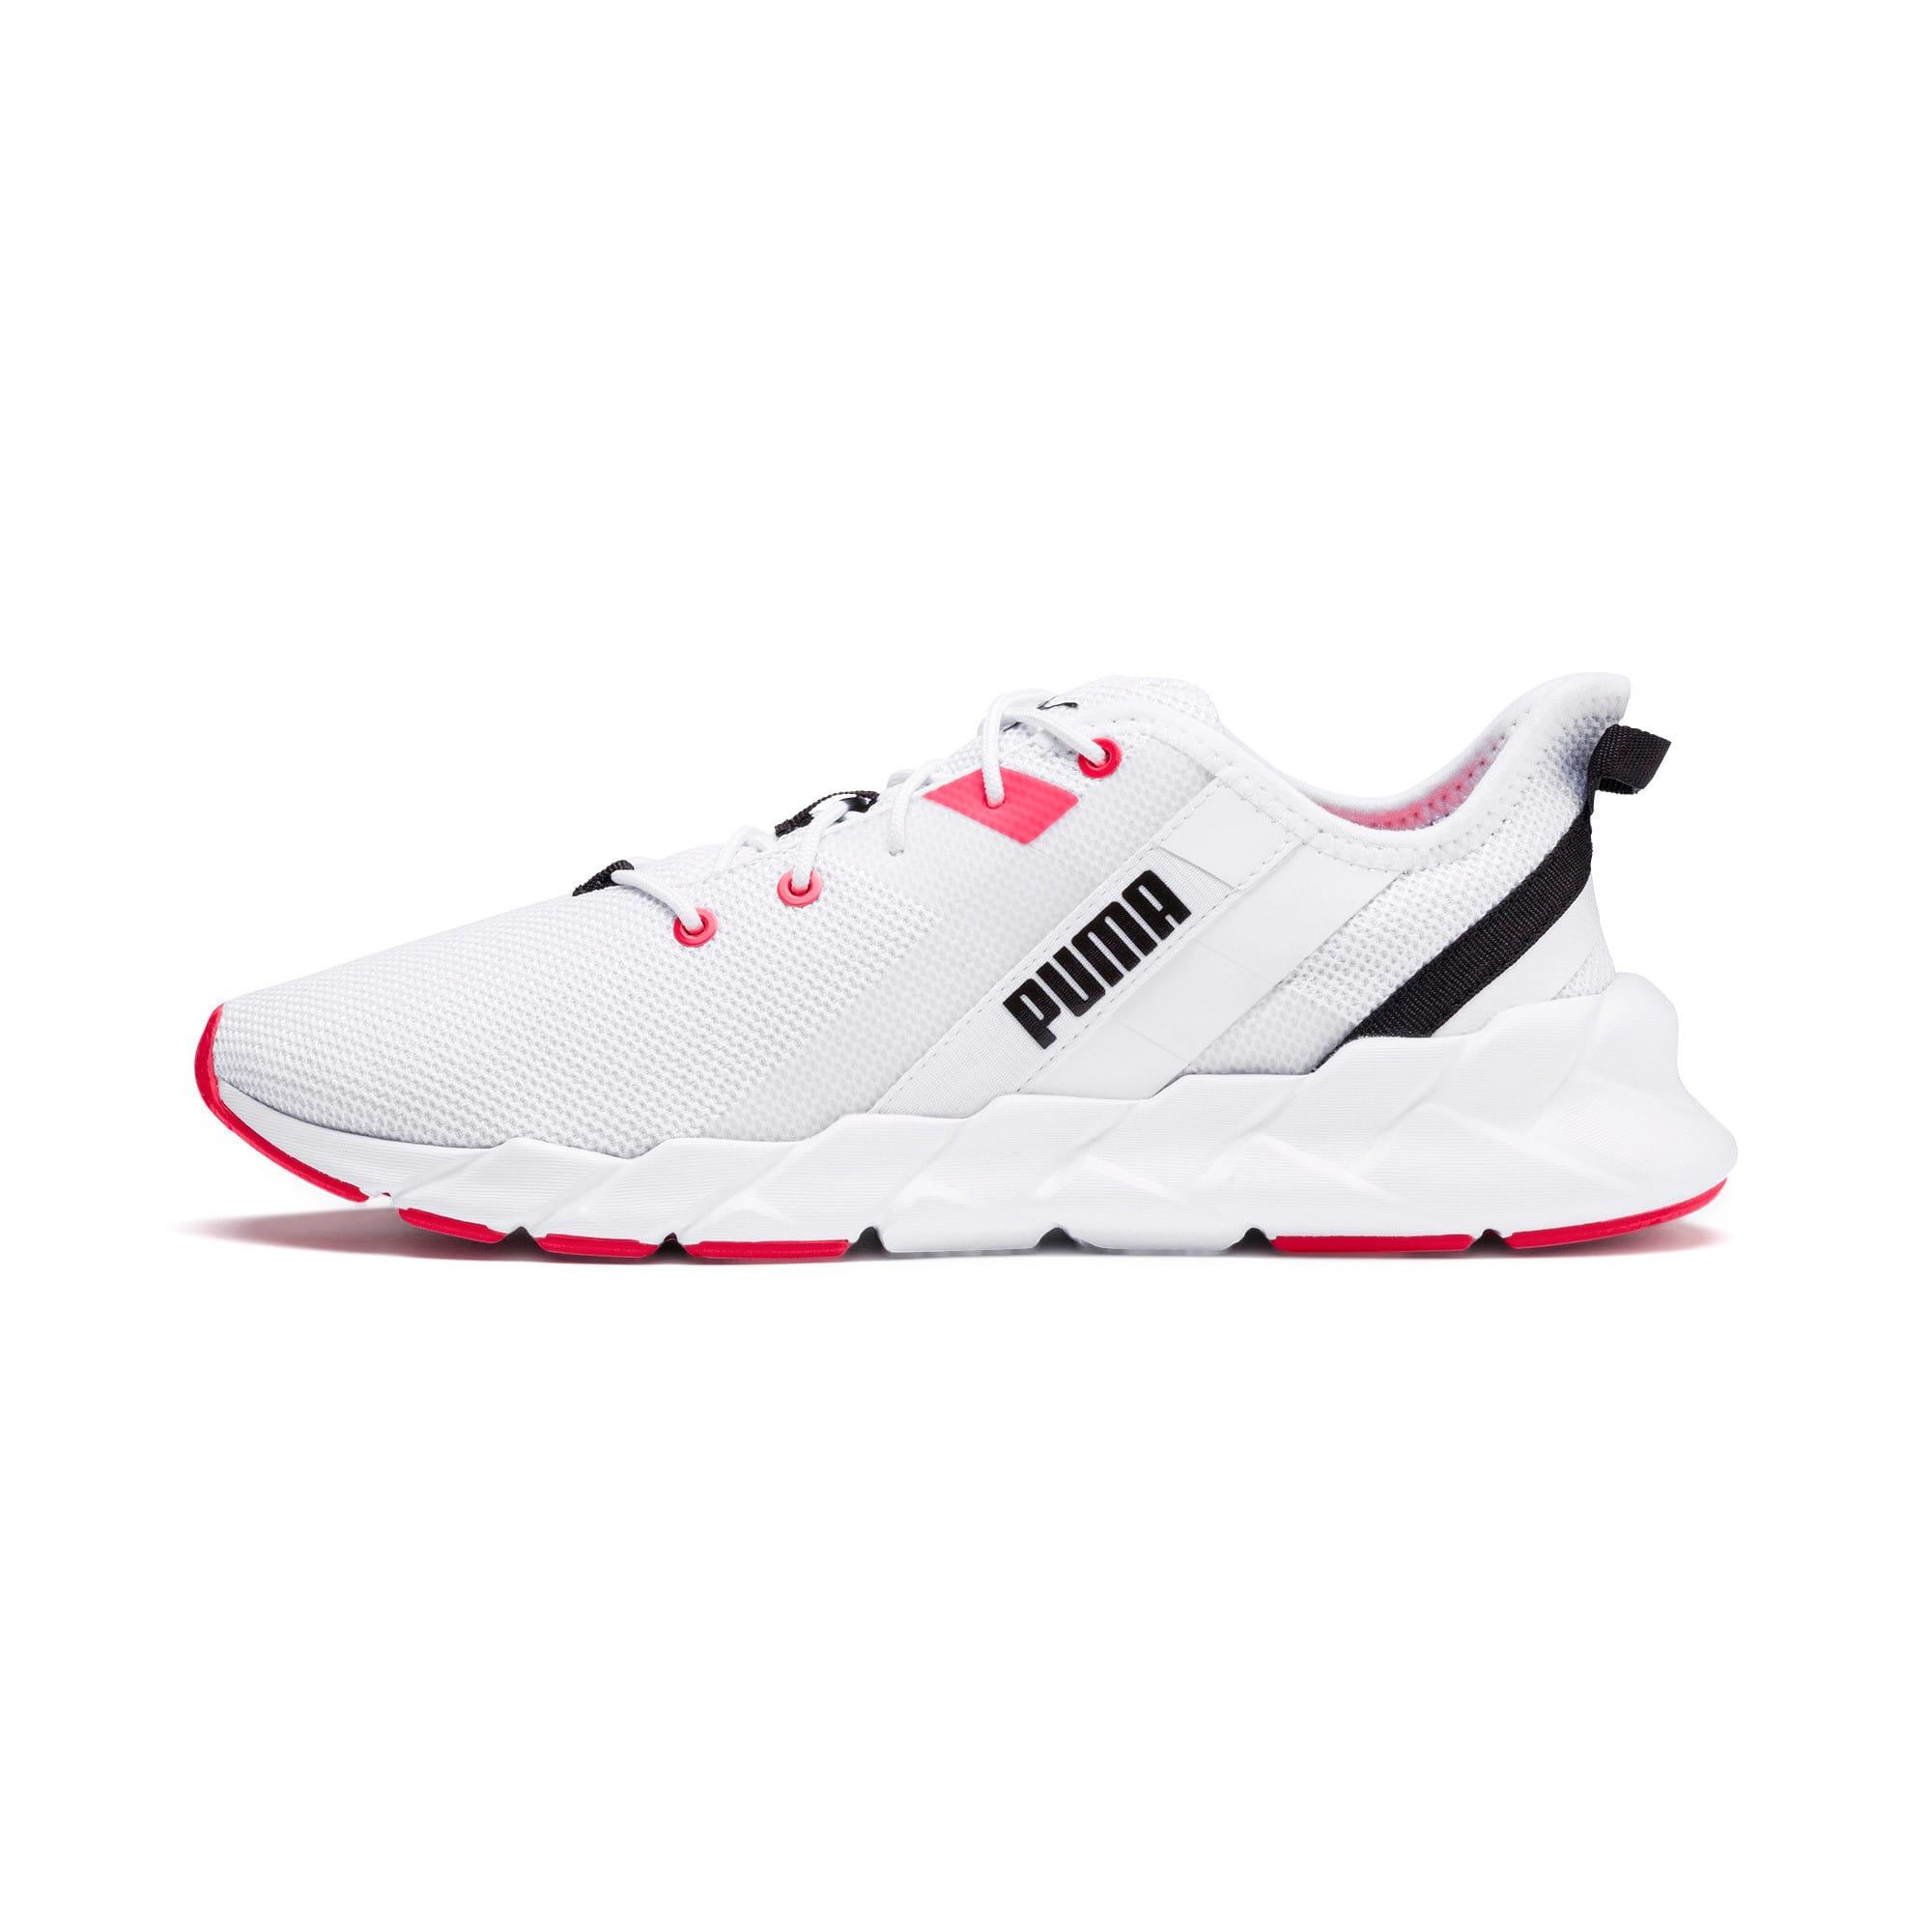 Thumbnail 1 of Weave XT Women's Training Shoes, Puma White-Pink Alert, medium-IND